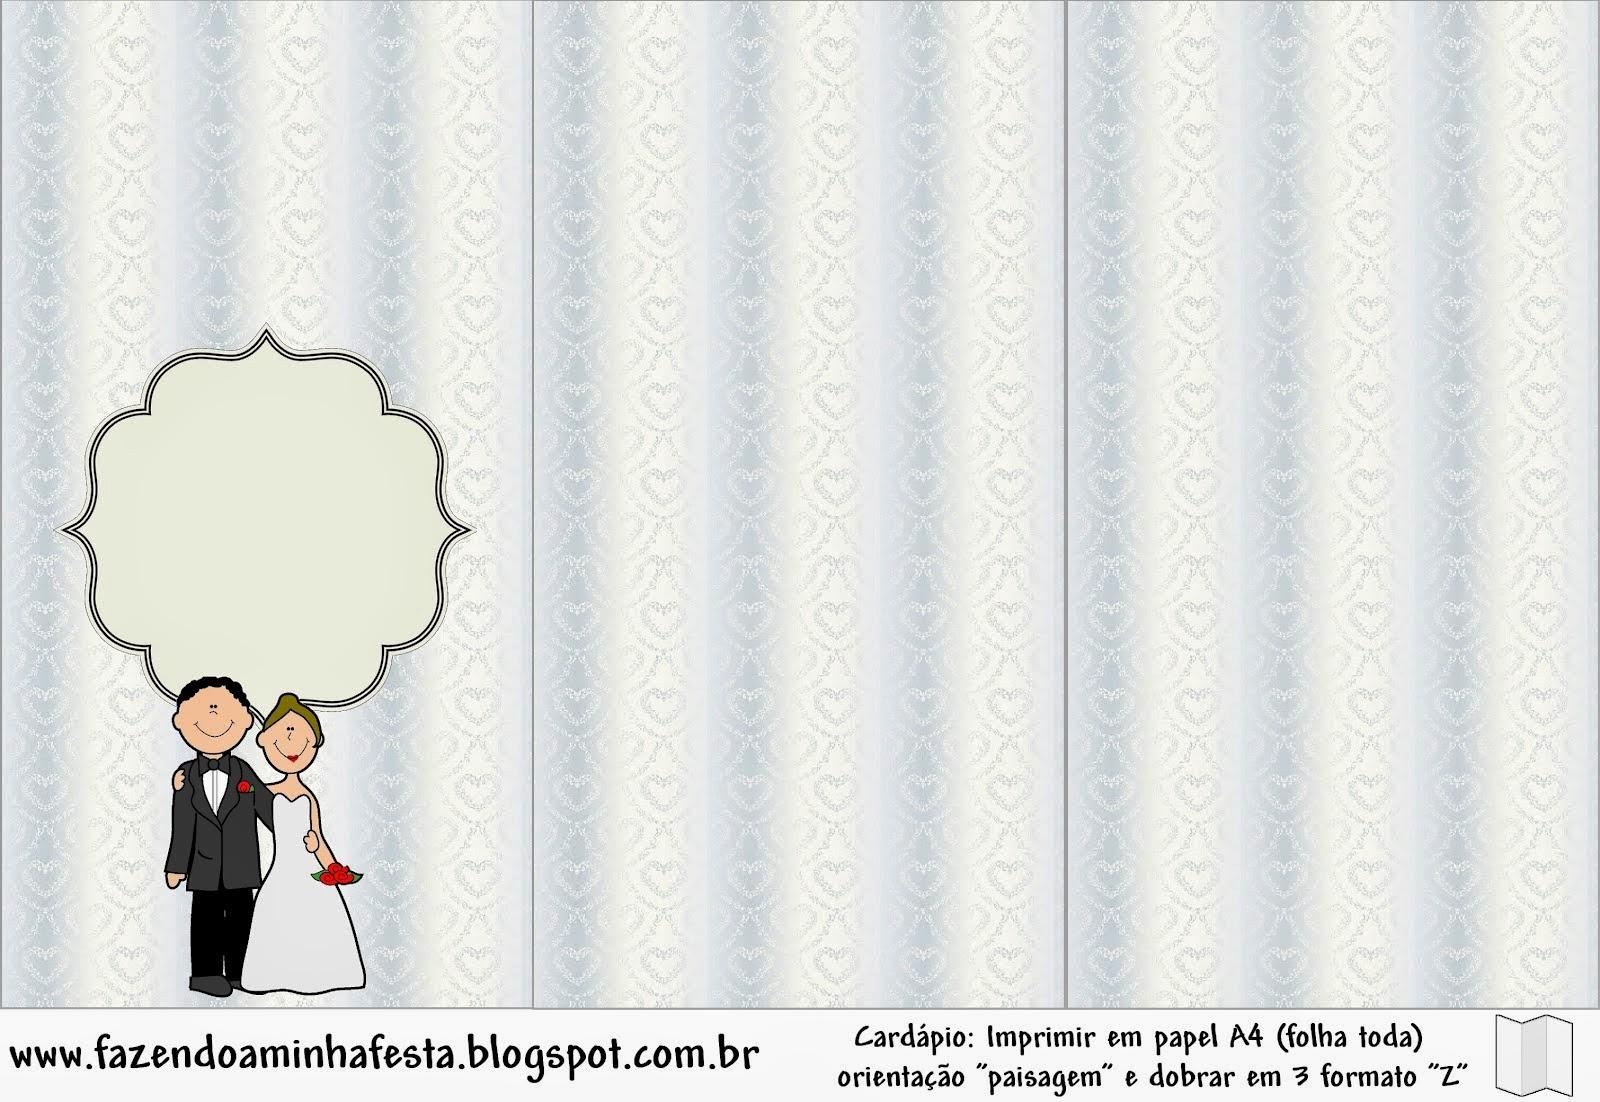 Linda Pareja de Novios: Imprimibles para imprimir Gratis. | Oh My Bodas!